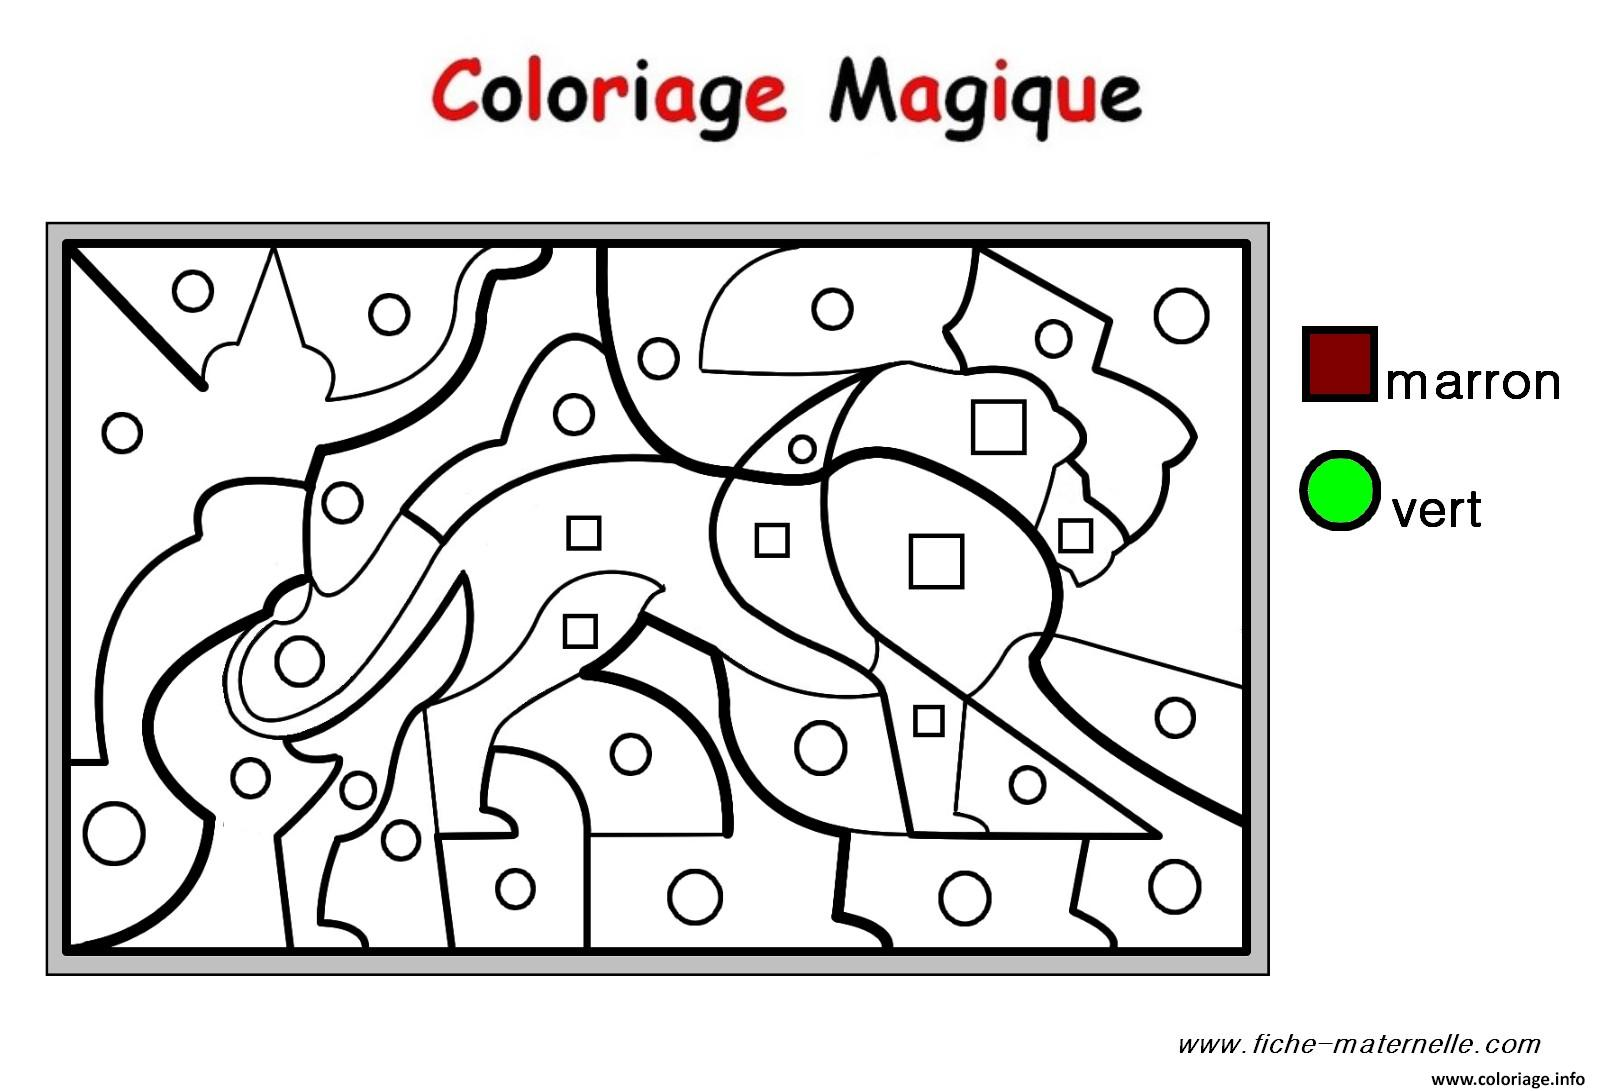 Coloriage Cirque Ps.Coloriage Rentree Maternelle Magique Dessin